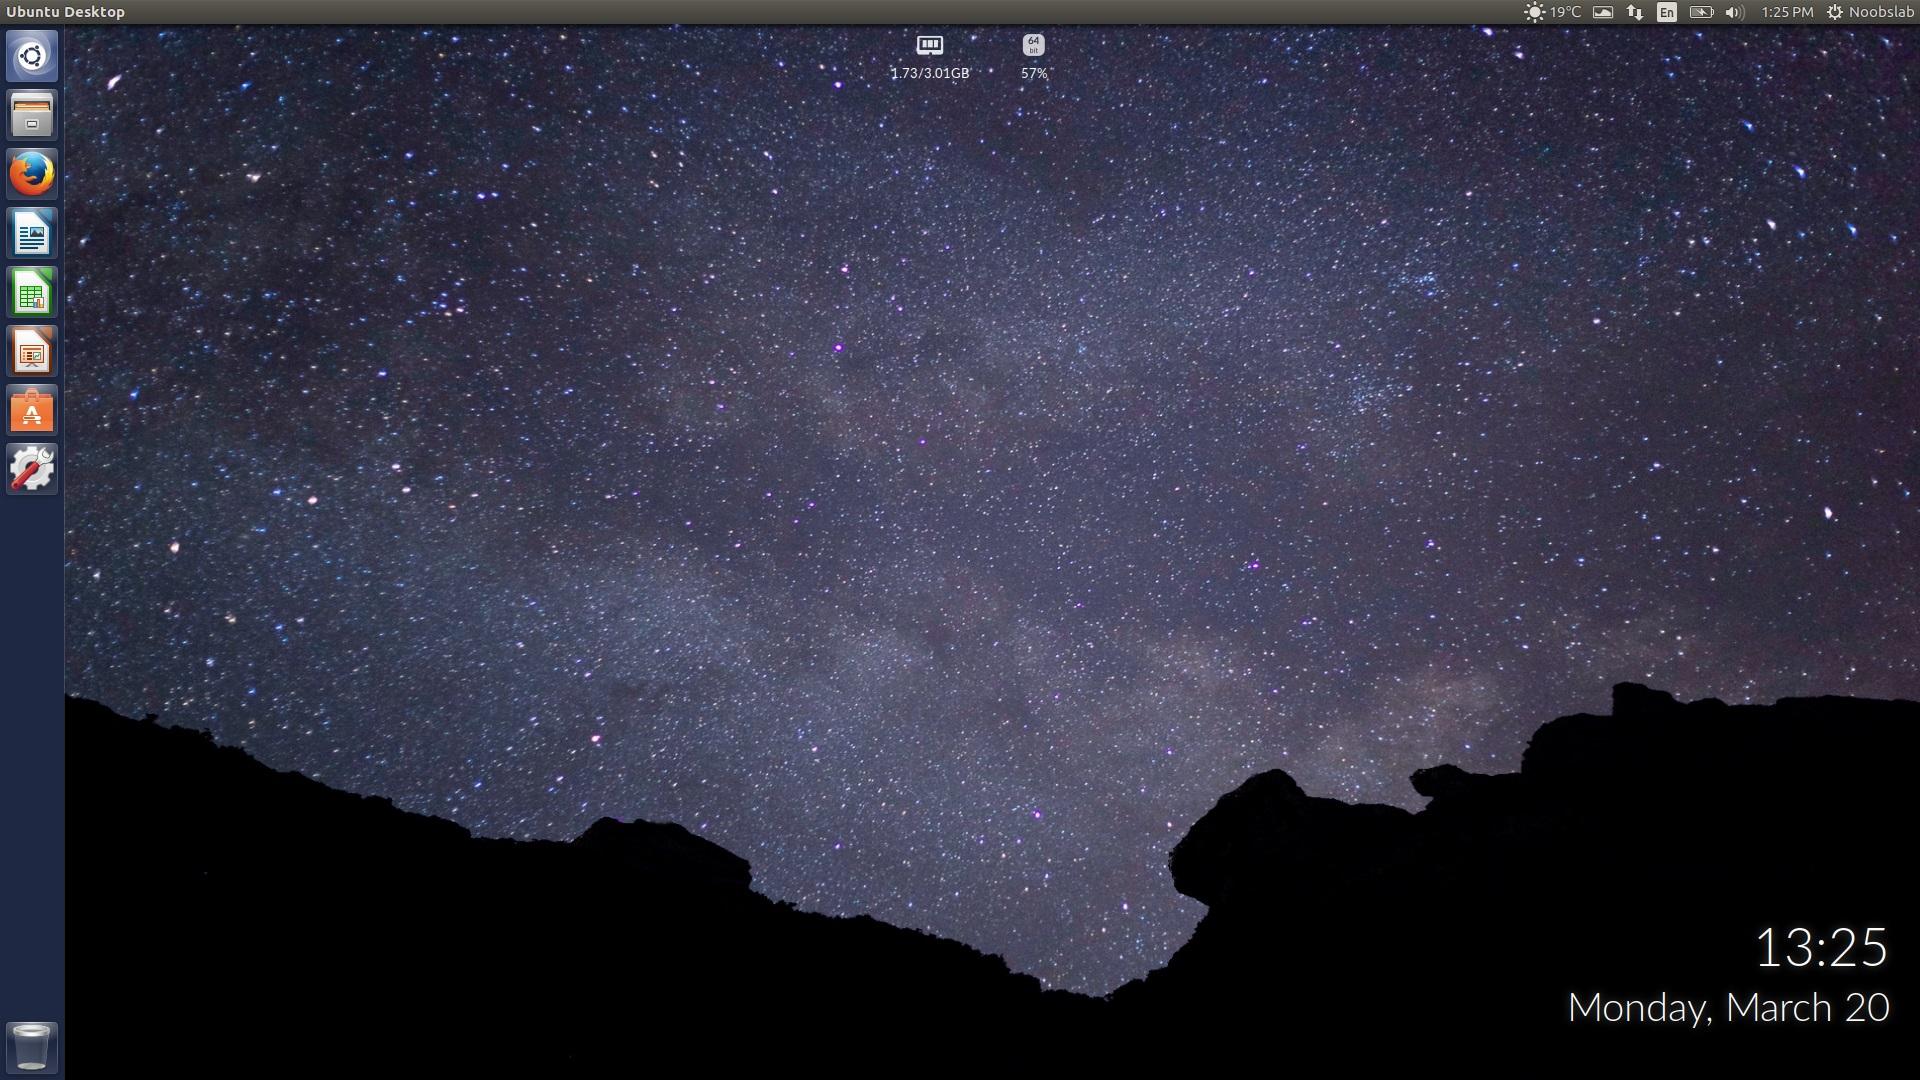 Komorebi: A New Way To Enhance Your Desktop Using Animated/Parallax